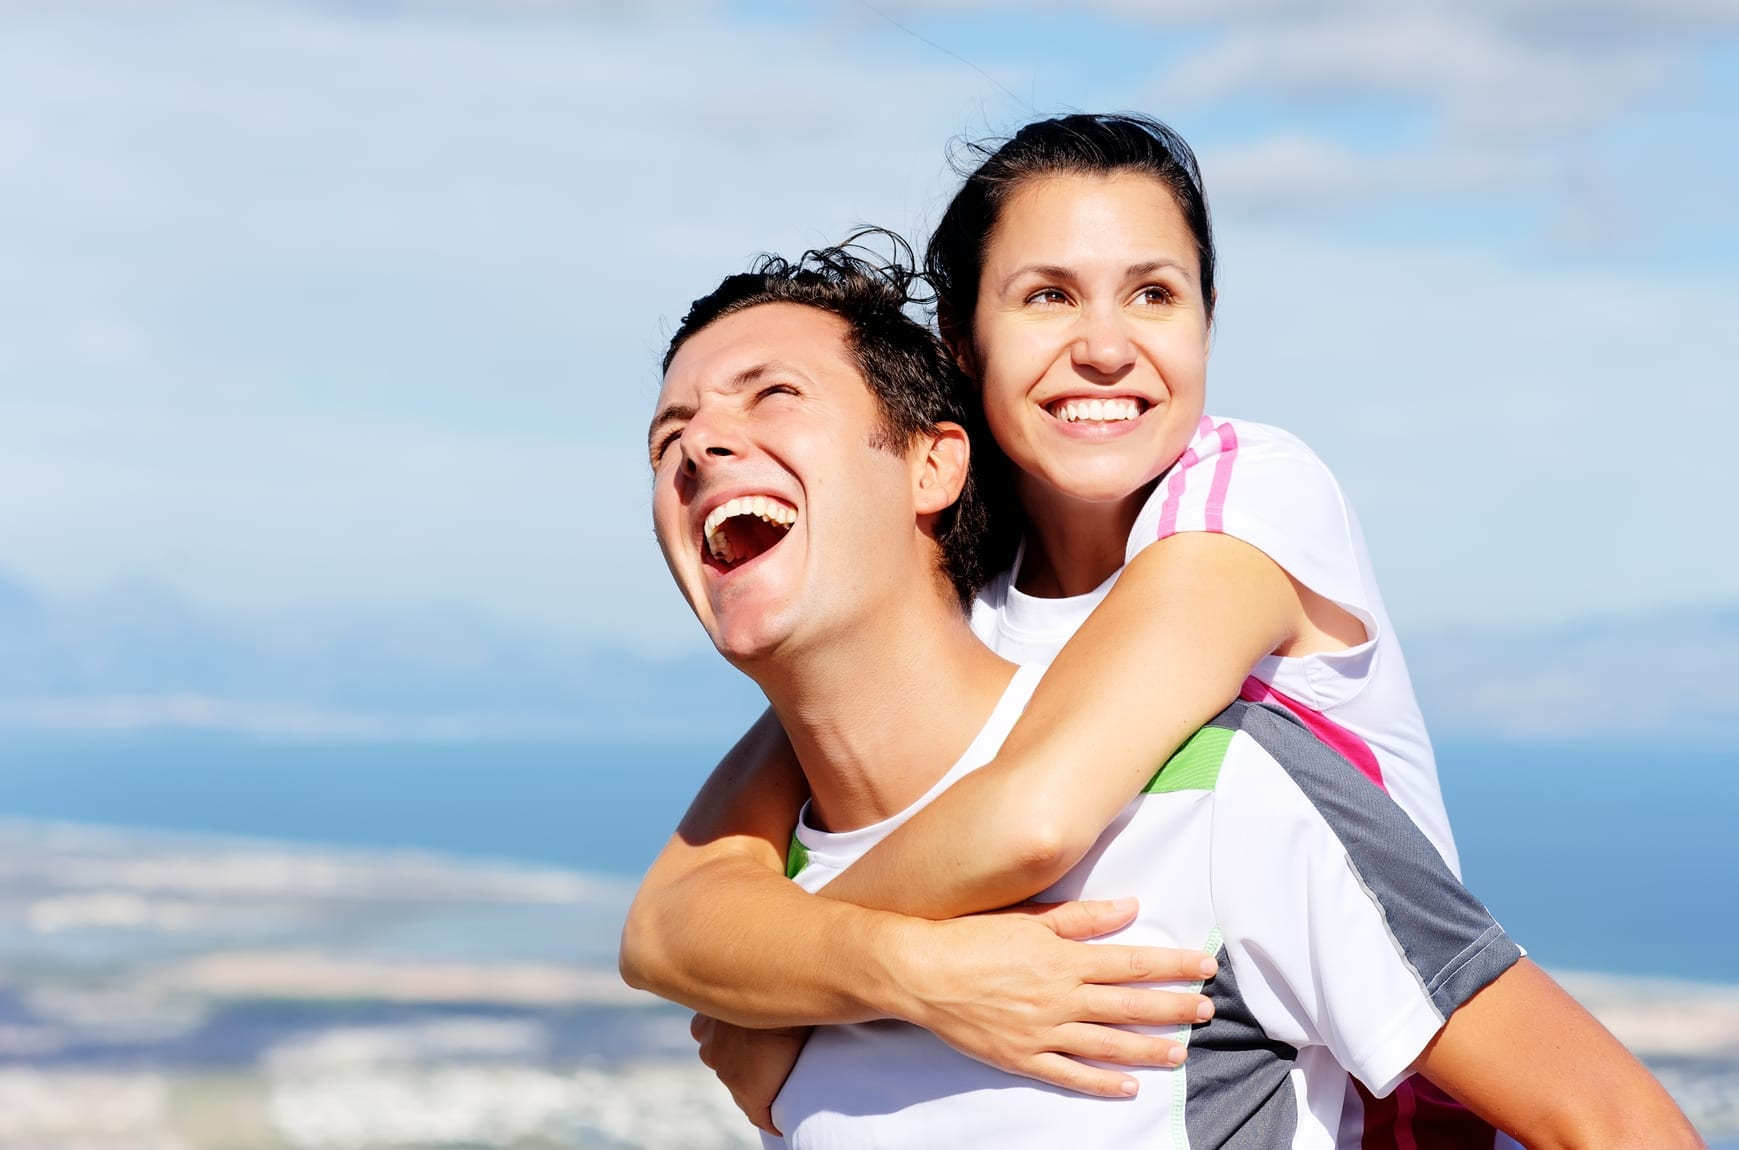 5 Ways To Lighten Up Your Relationship